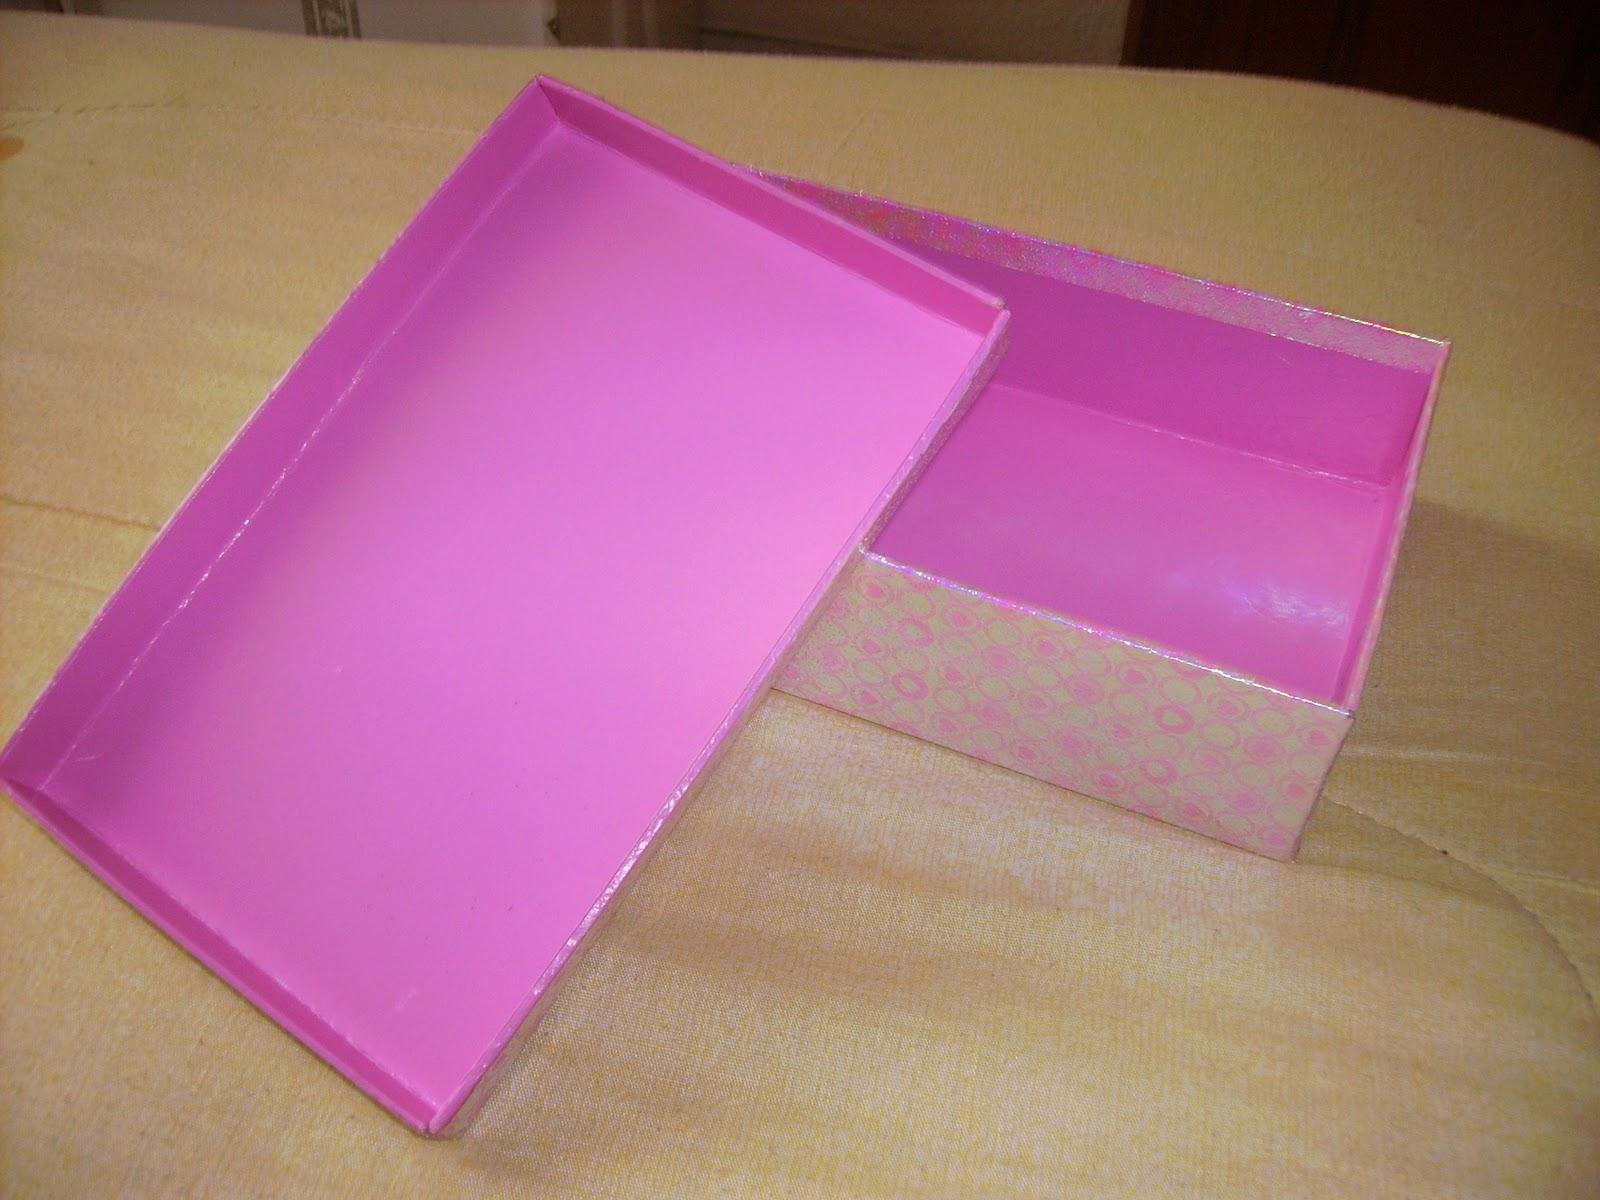 Mardedi para forrar cajas de zapatos - Cajas transparentes para zapatos ...